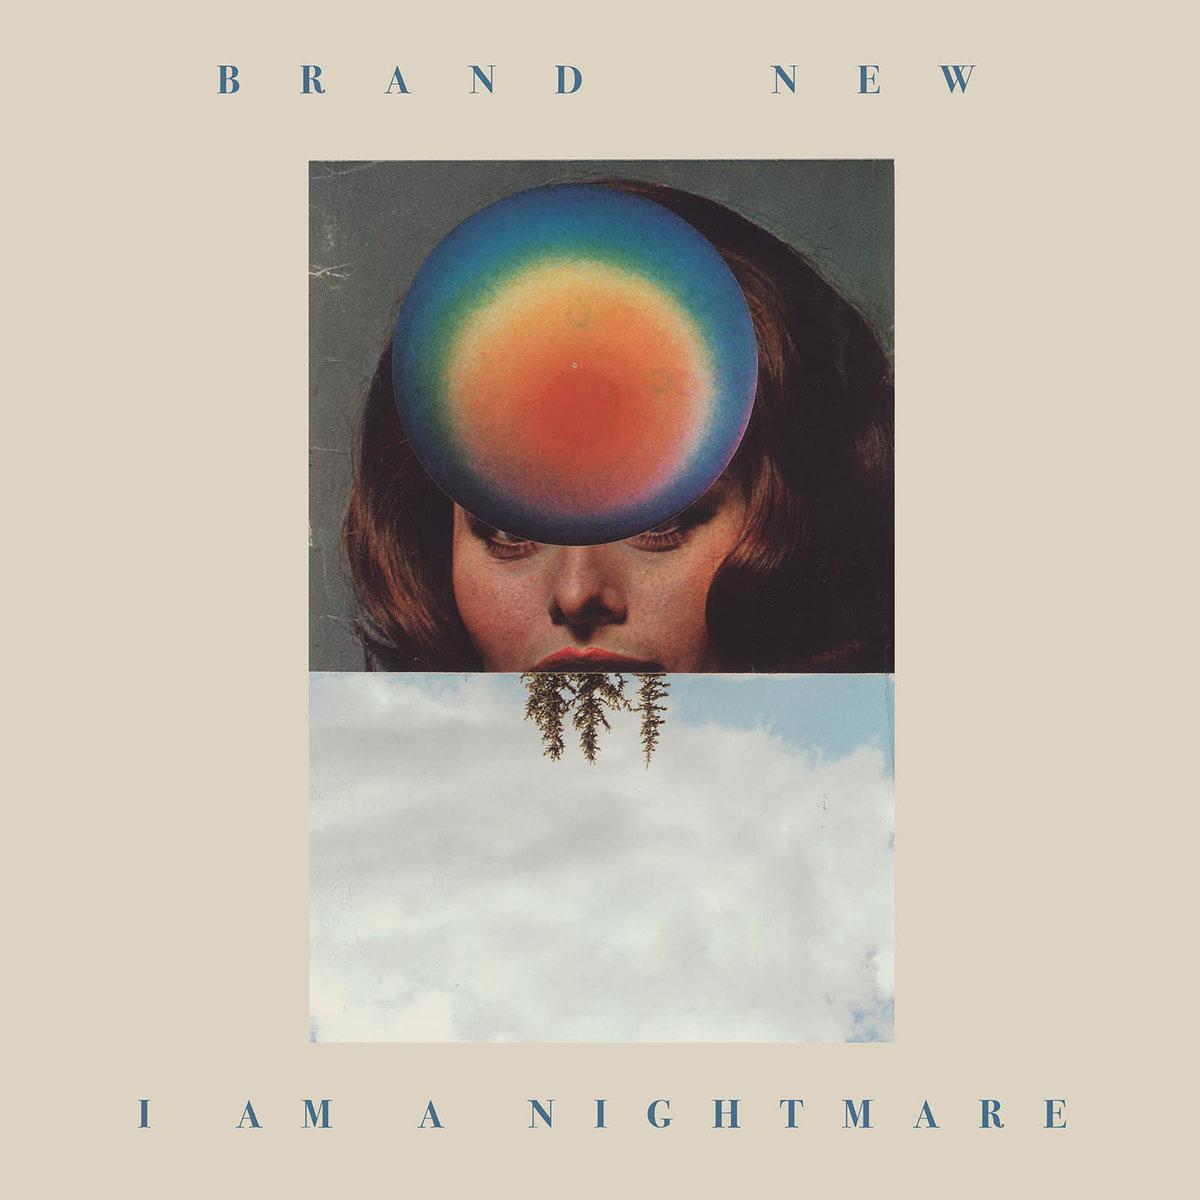 I Am A Nightmare - Brand New